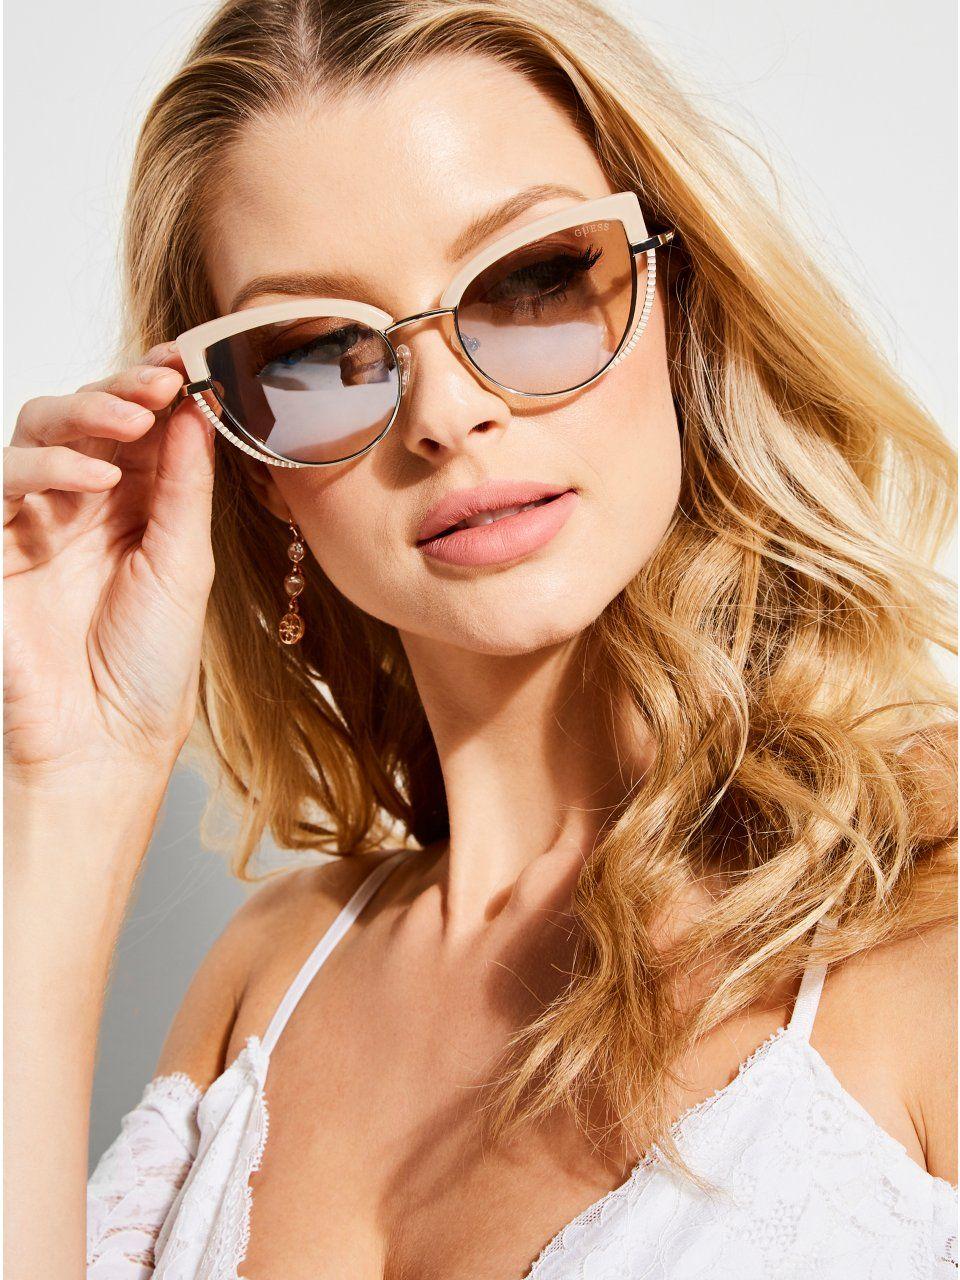 G Glasses Polarized Womens Ladies Girls Designer Celebrity Sunglasses Eyewear